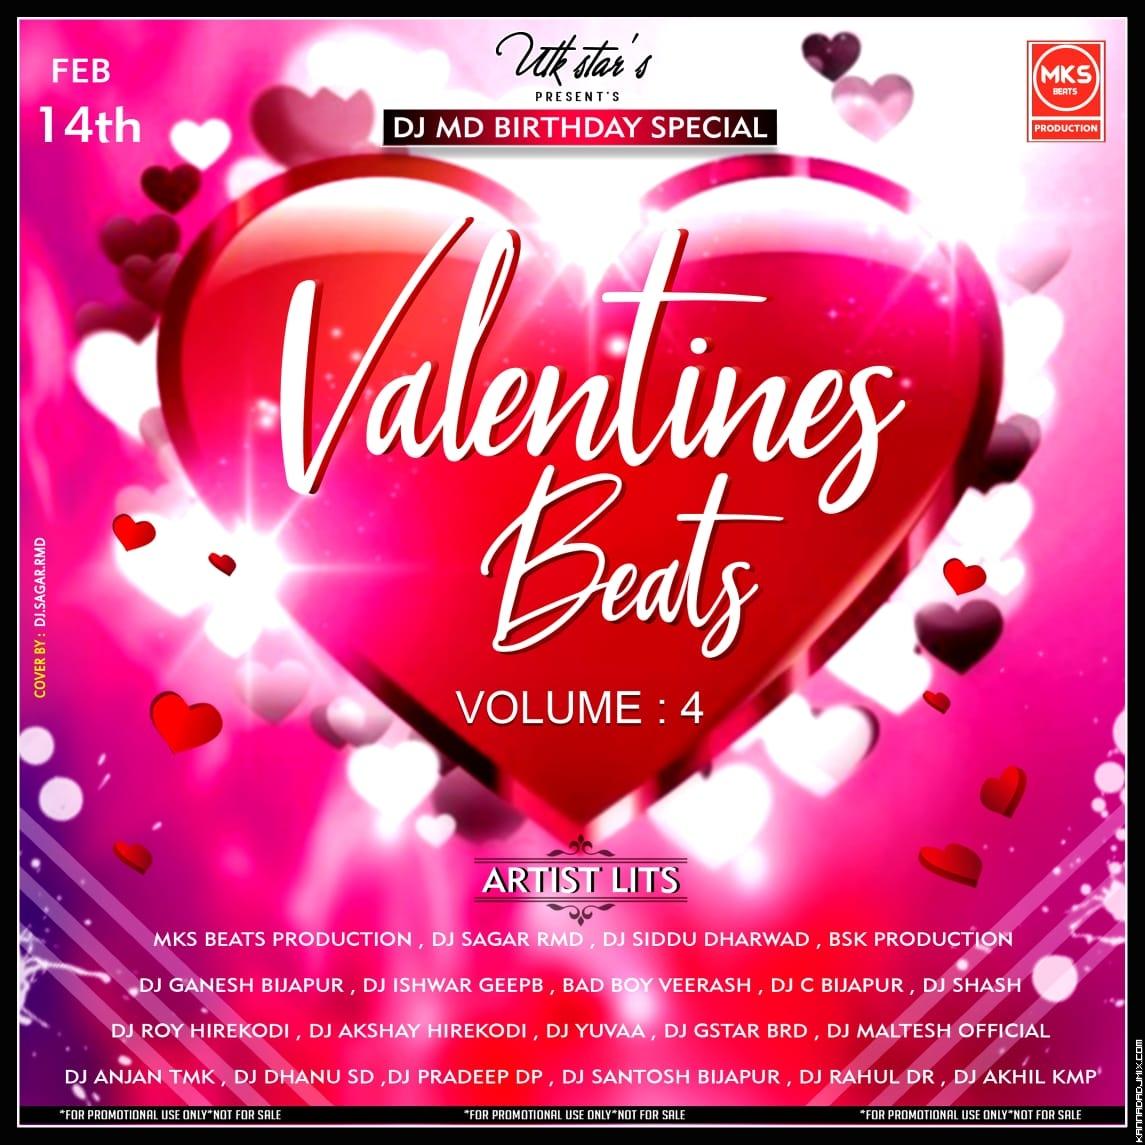 7-TELIPHONE GELATHI-DJ YUVAA×G STAR BRD.mp3